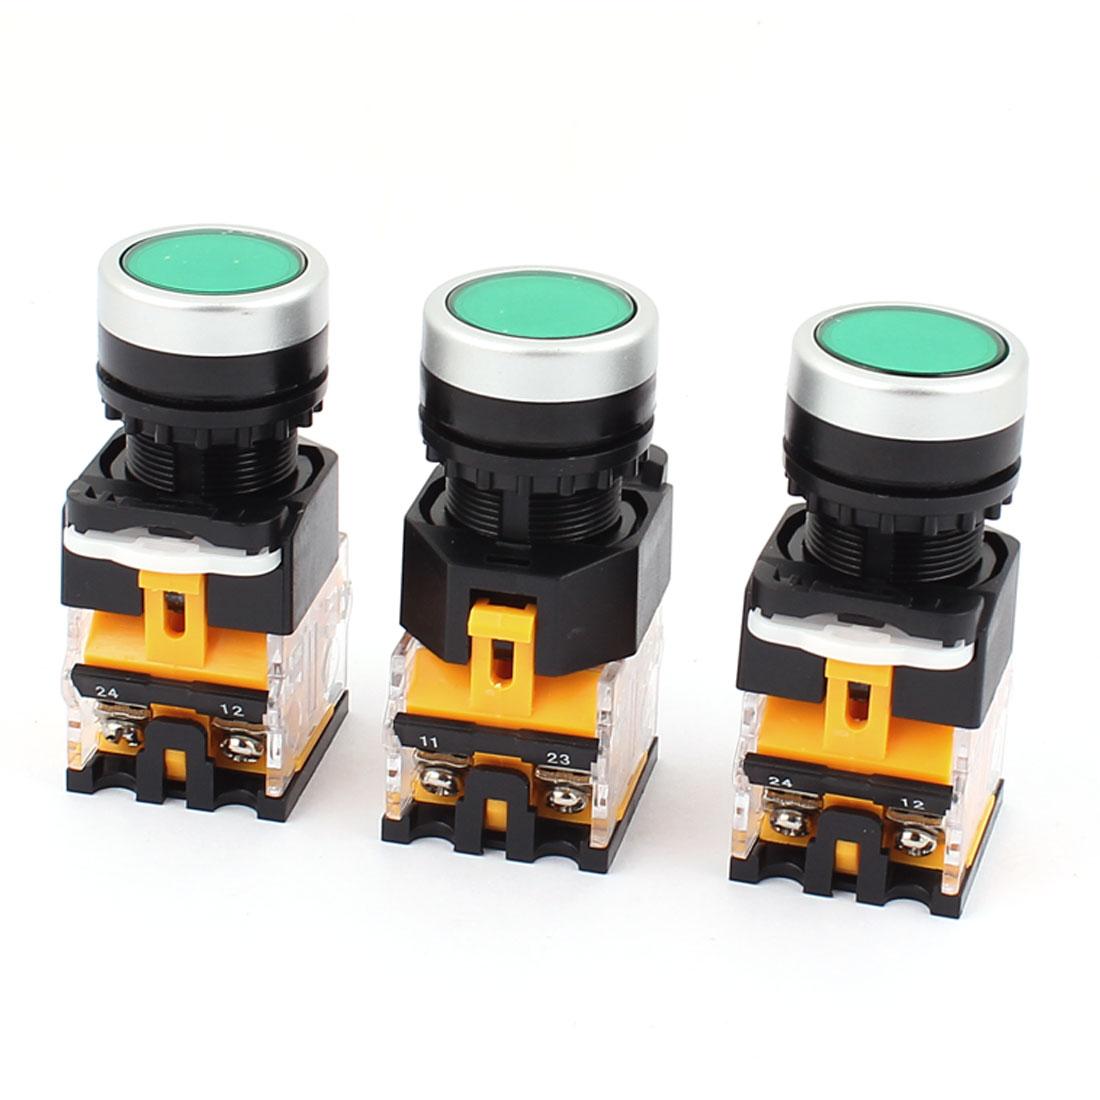 AC 660V 10A NO NC 4-Pin Momentary Green Push Button Switch 3PCS